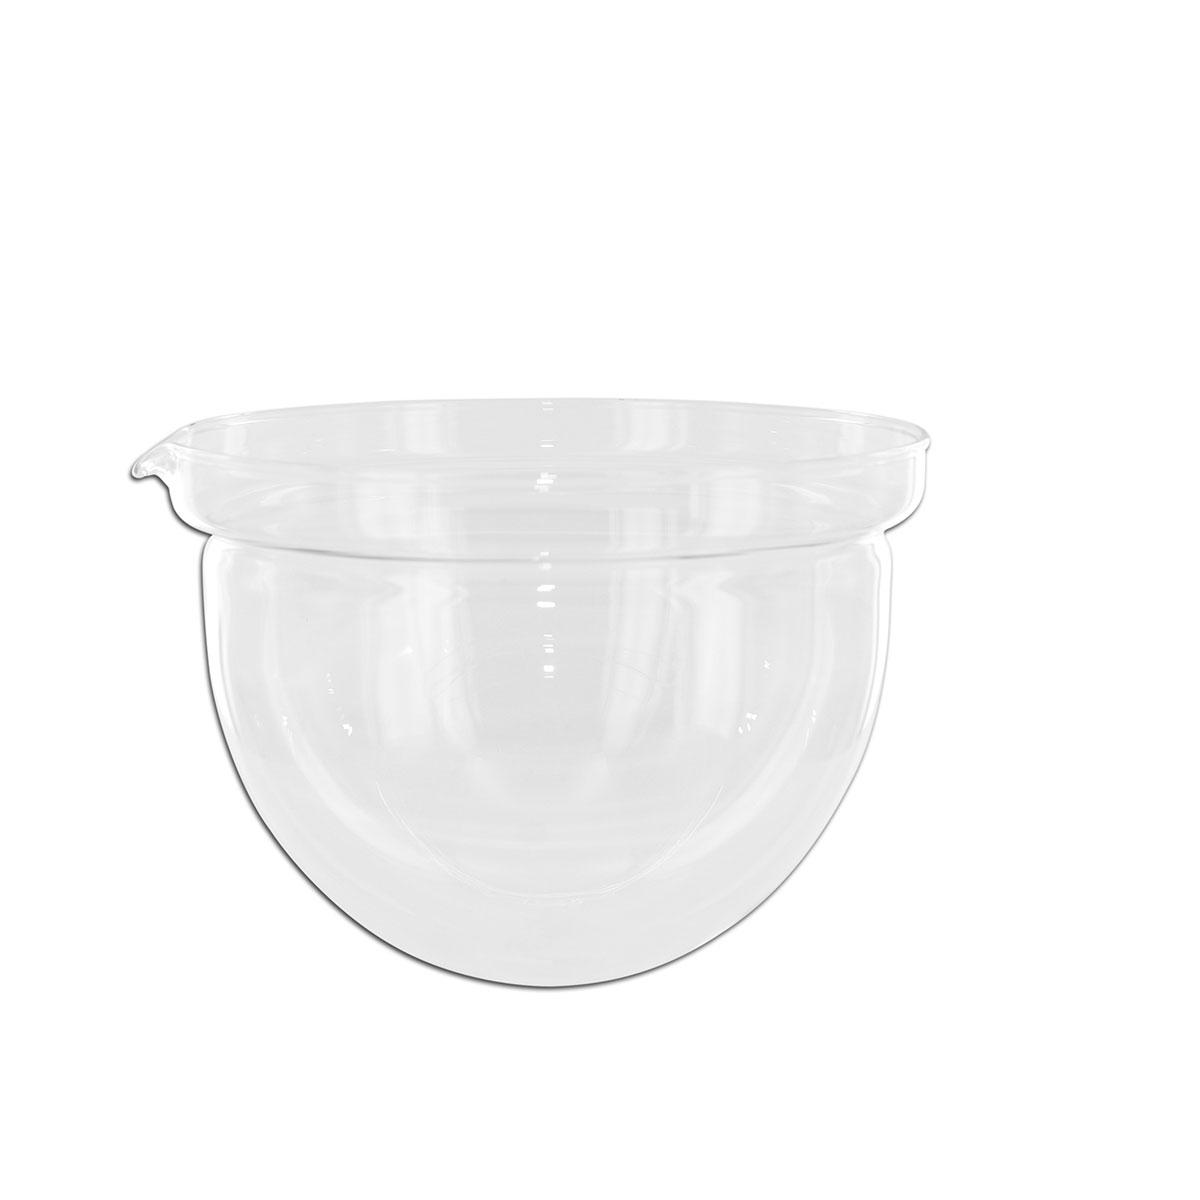 Ersatz-Teekannenglas